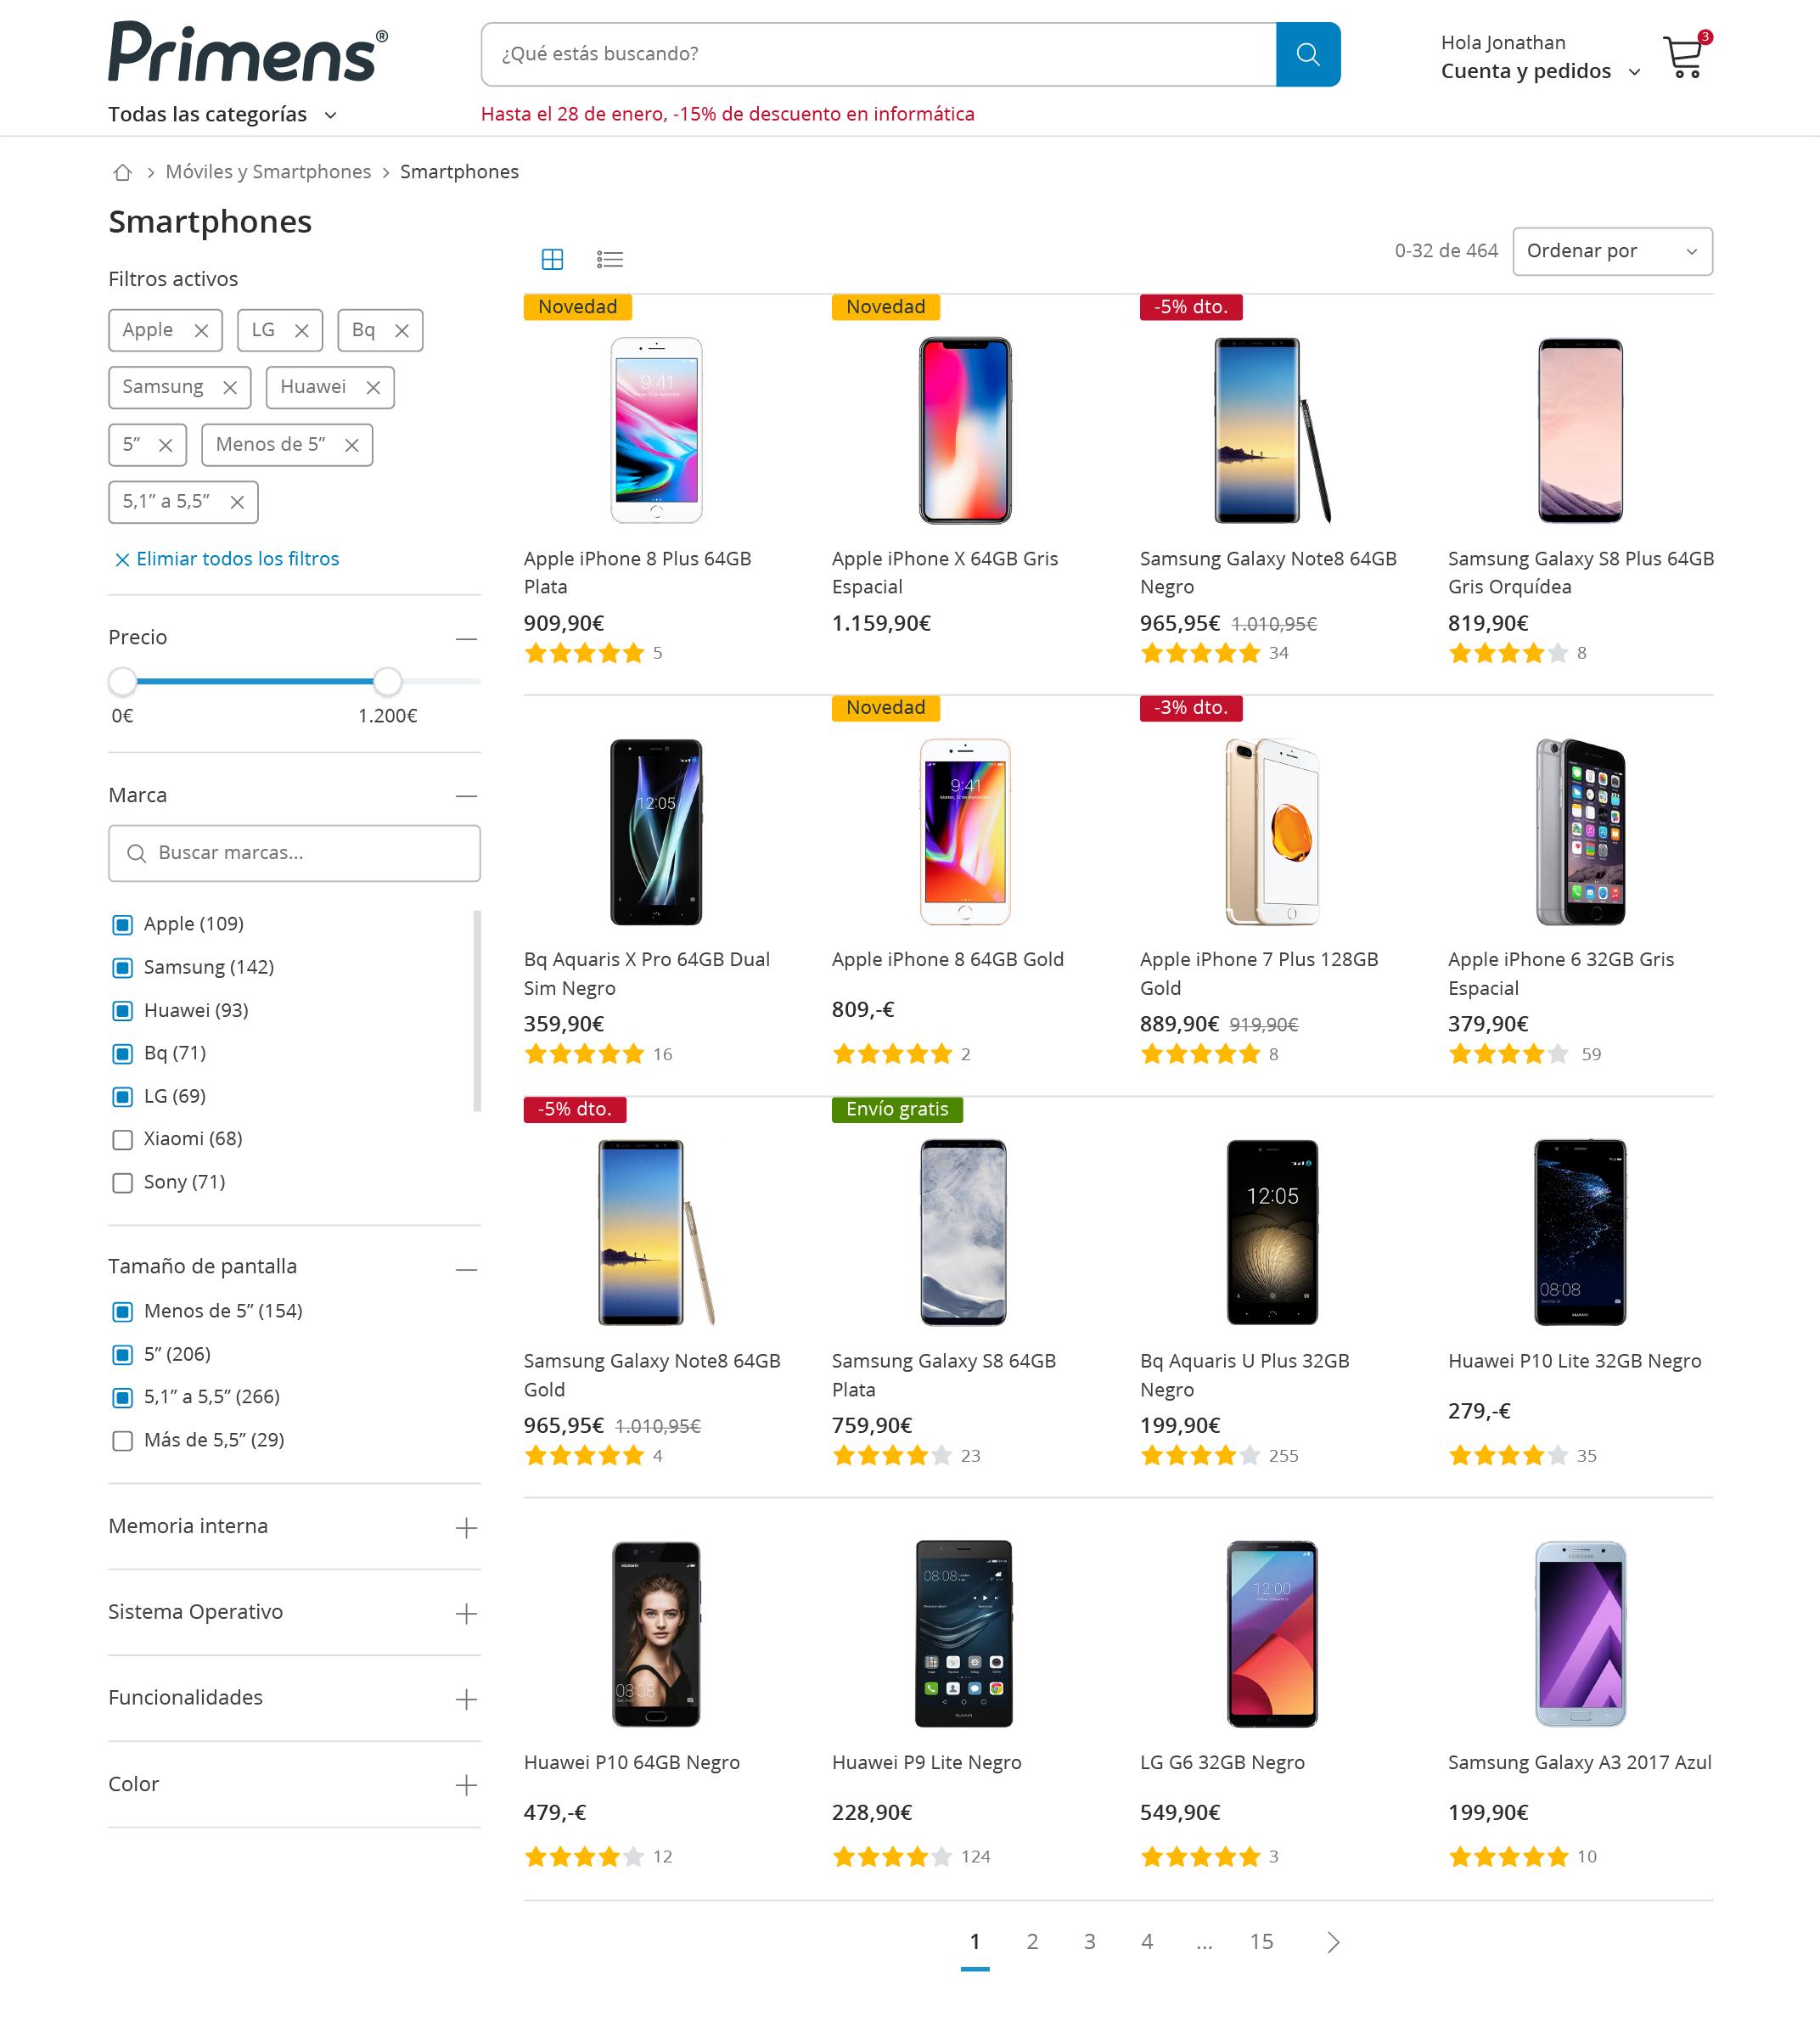 Primens product page design